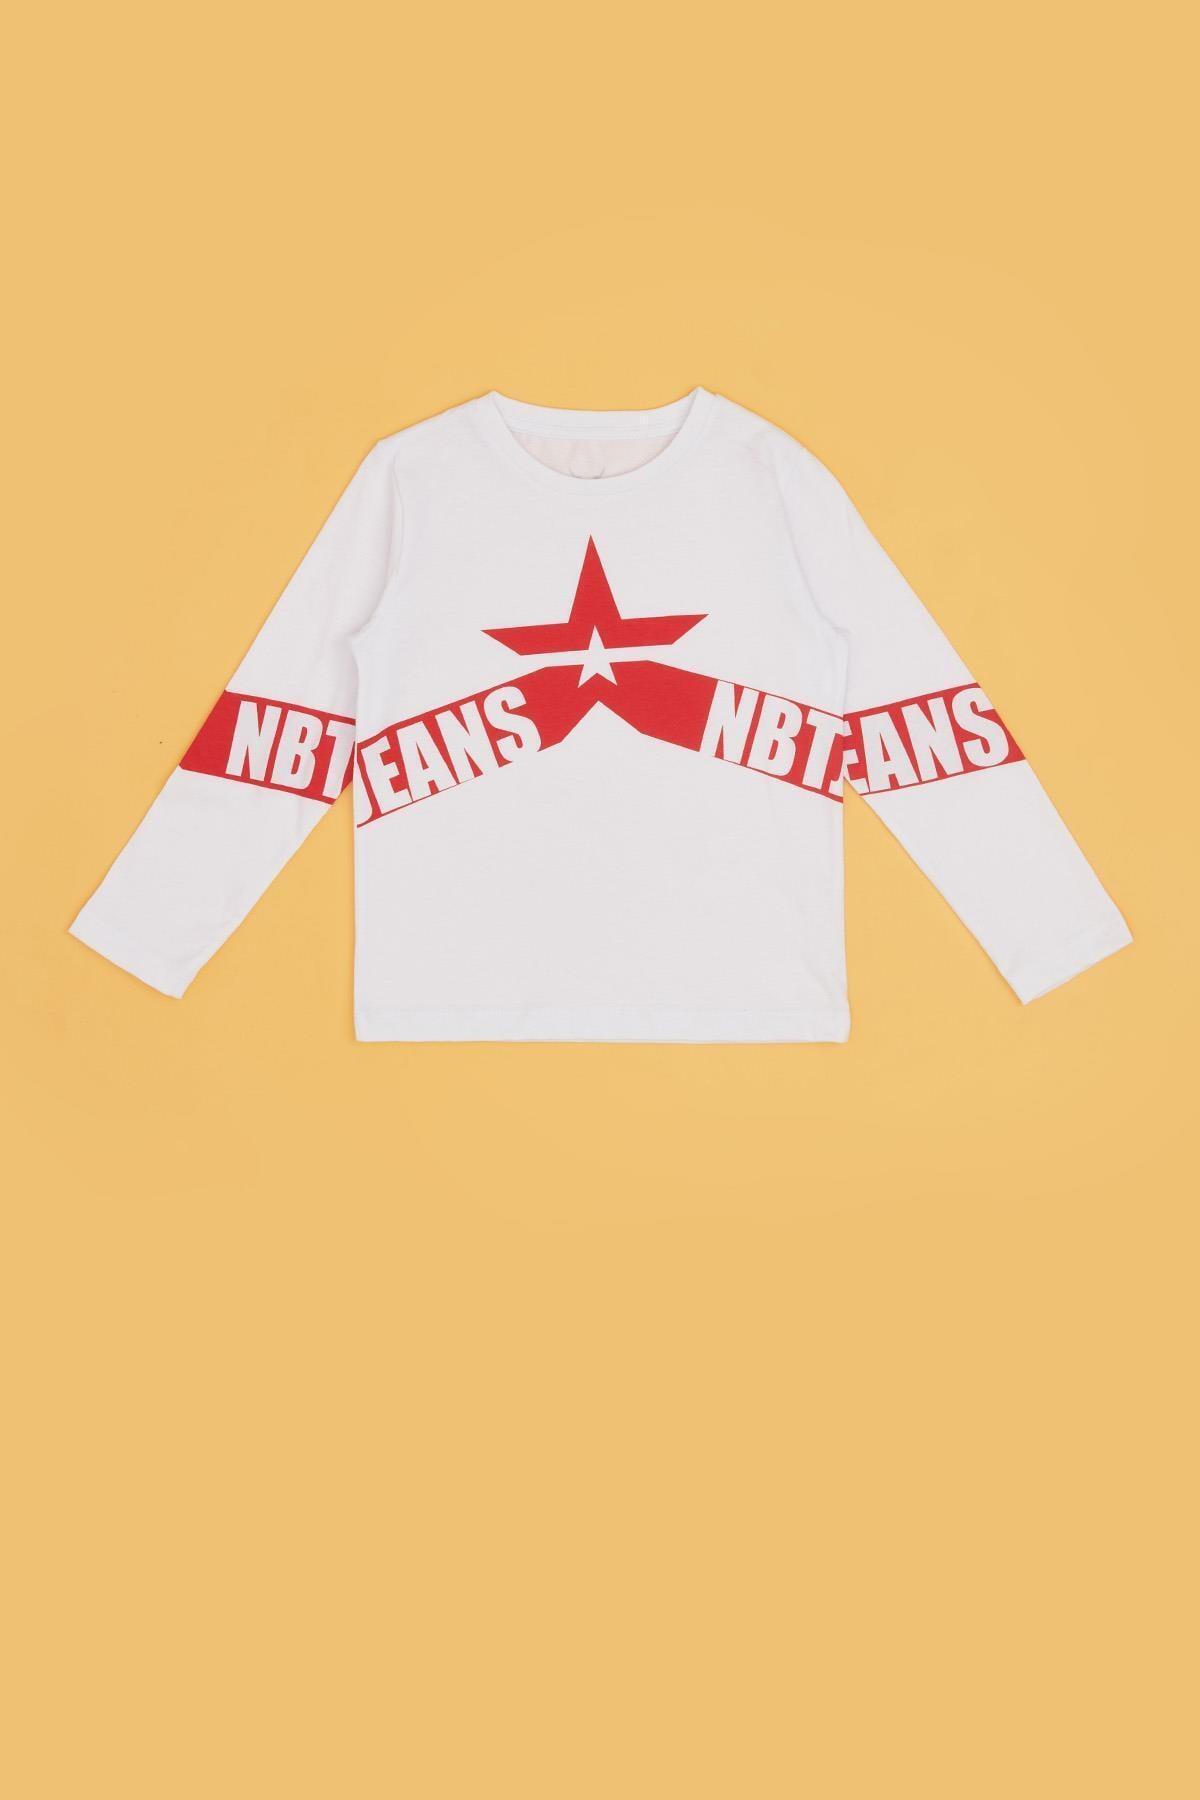 Nebbati Erkek Çocuk Beyaz T-shirt 20pfwnb3501 2